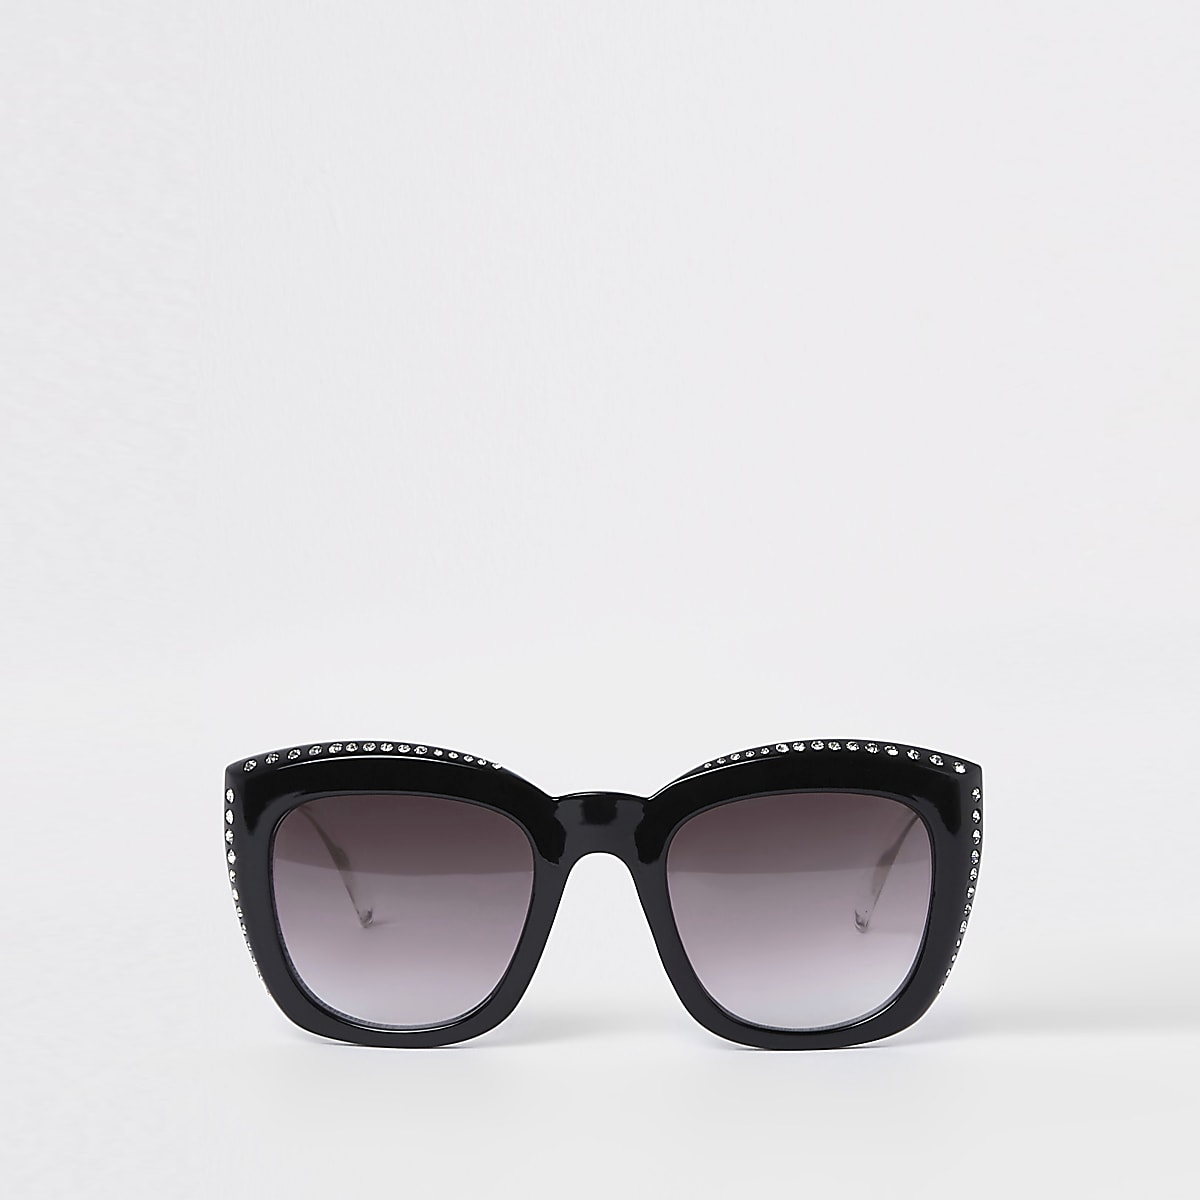 Black diamante studded glam sunglasses